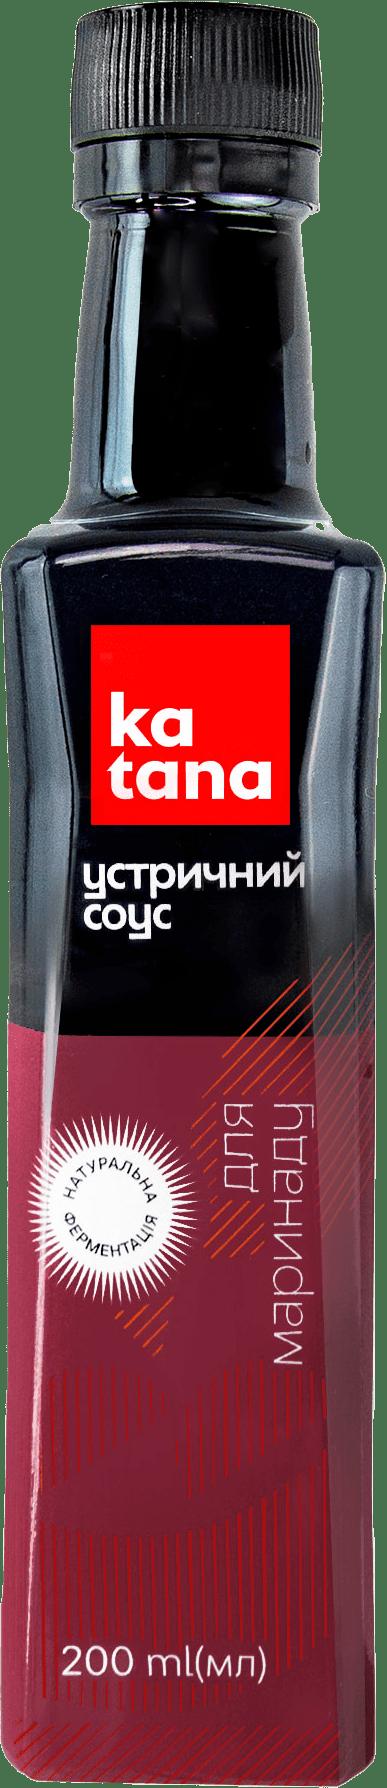 Устричний соус Katana